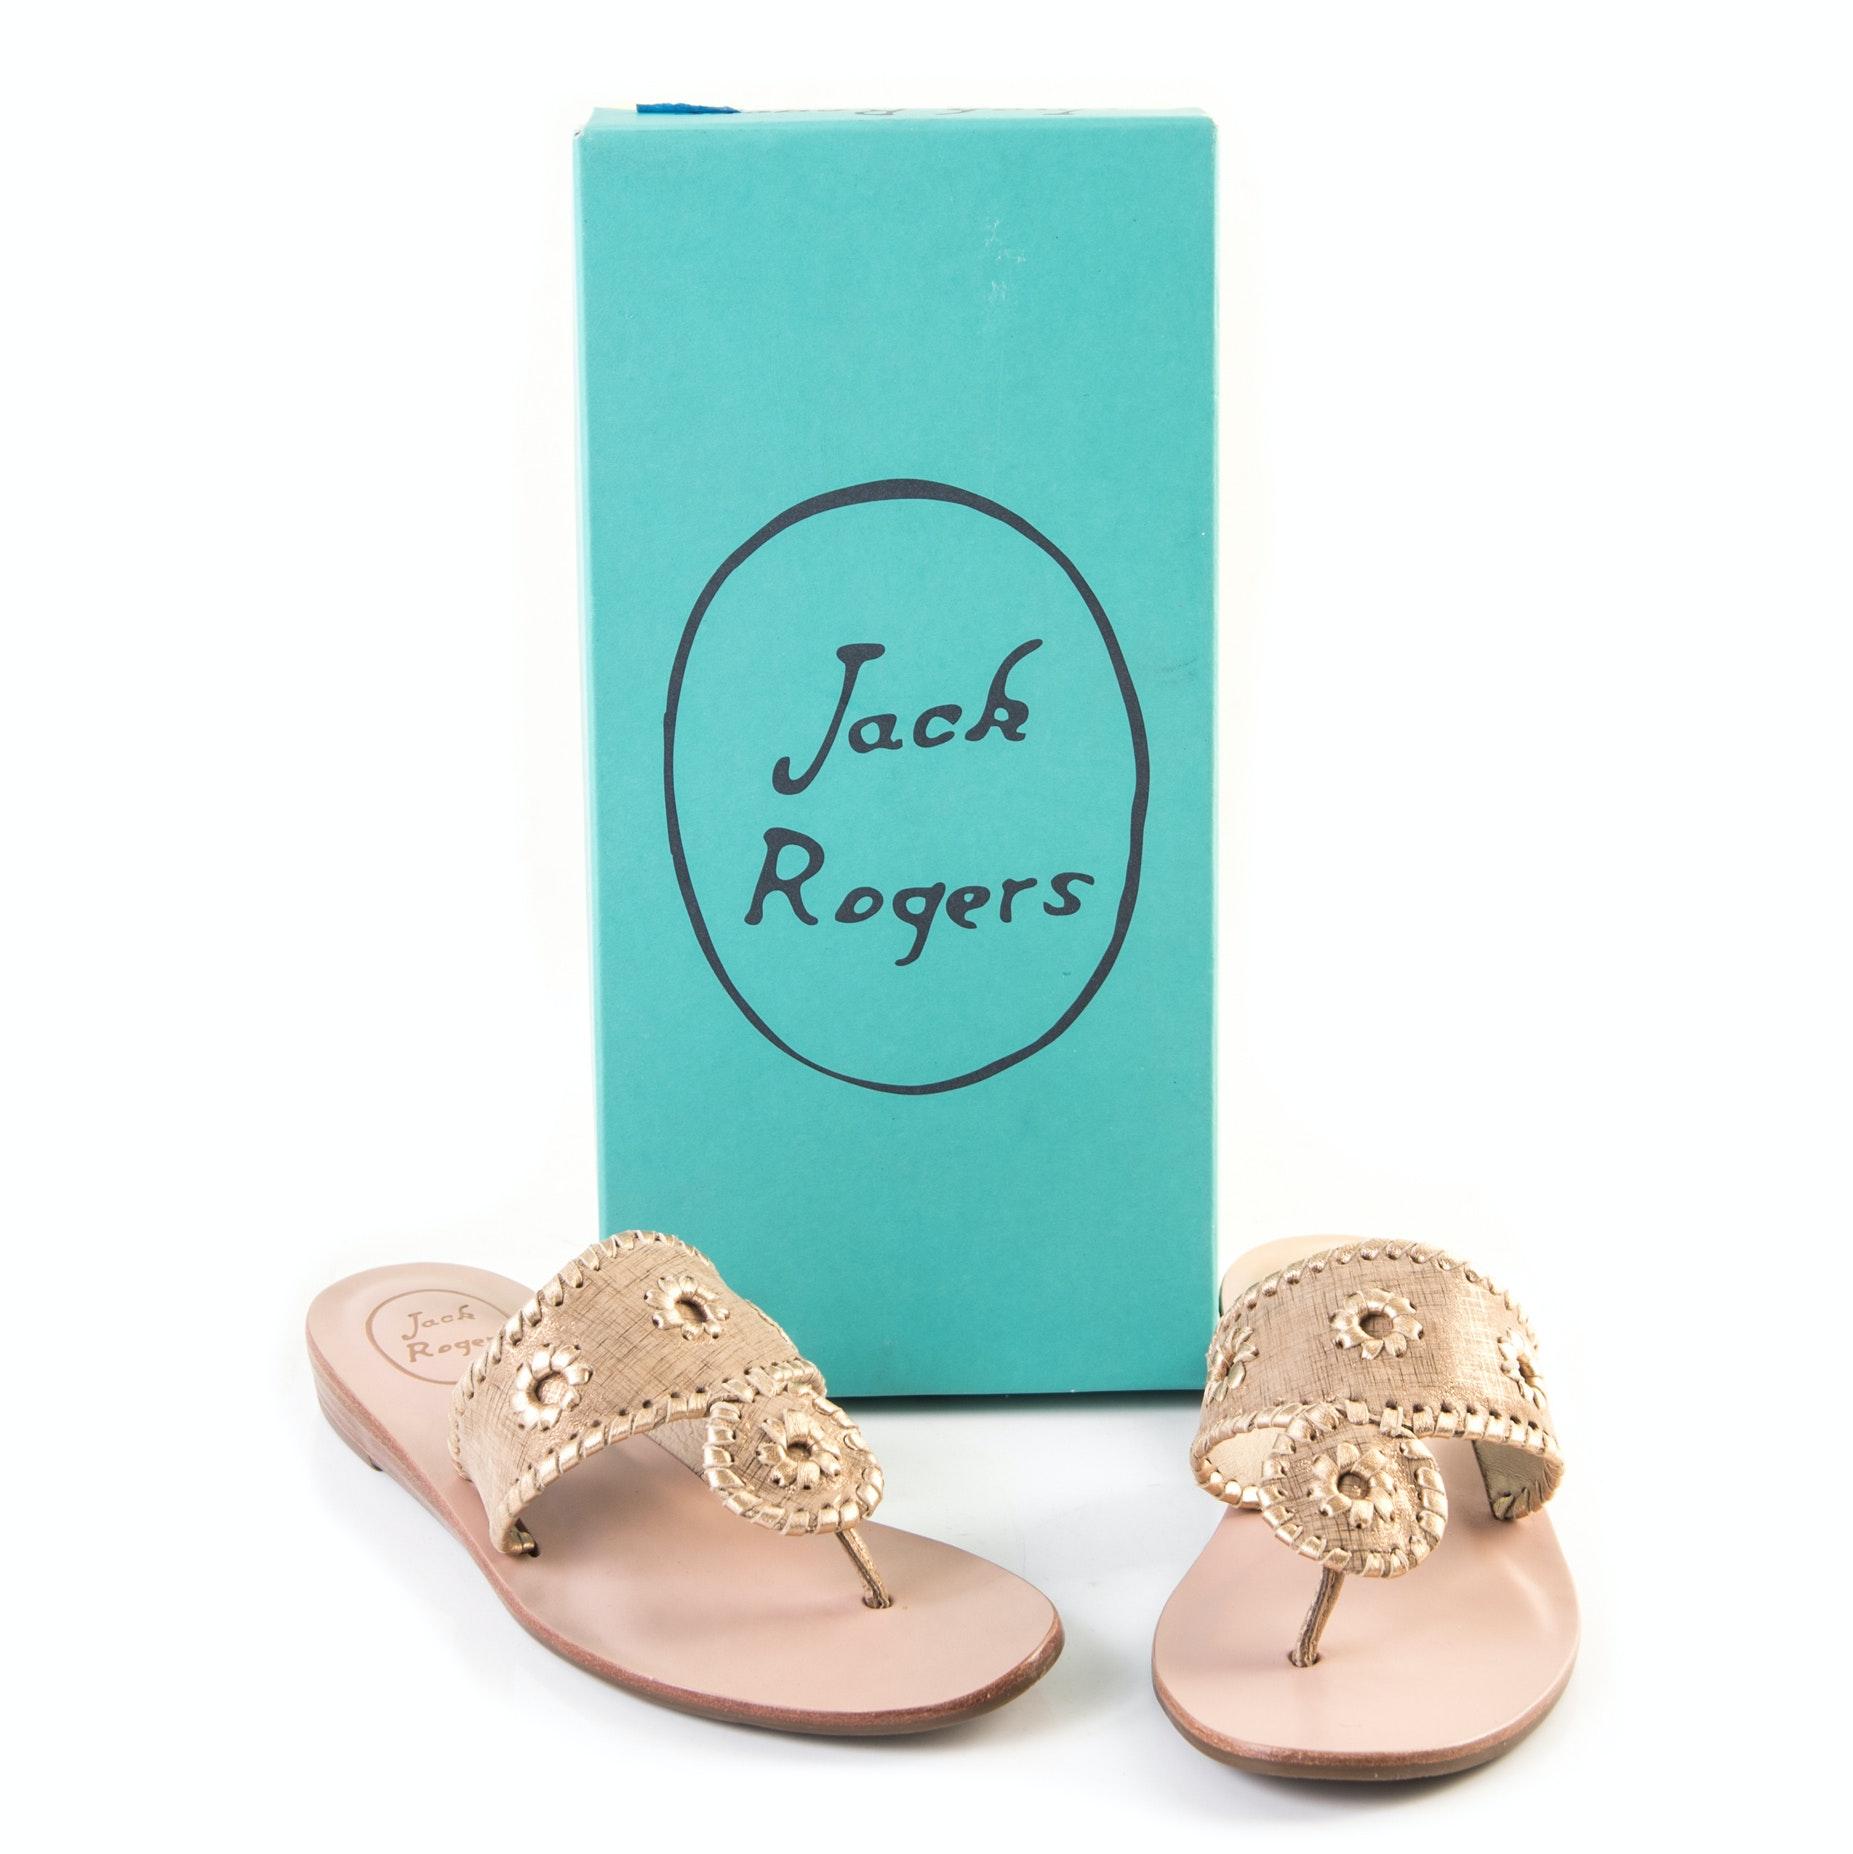 Jack Rogers Capri Etched Thong Sandals